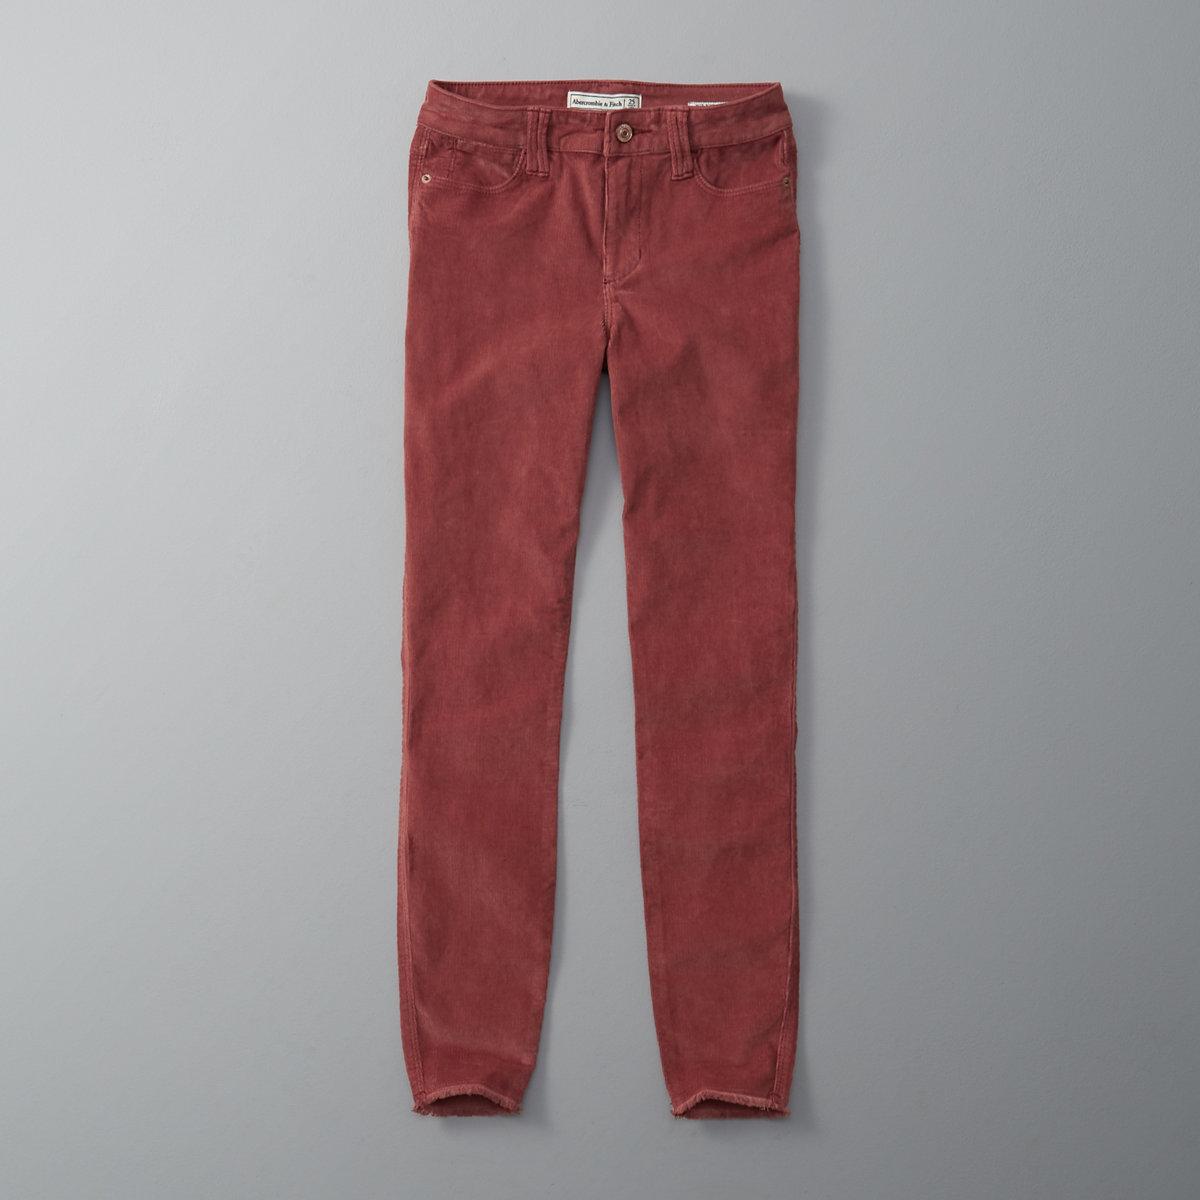 Super Skinny Corduroy Pants